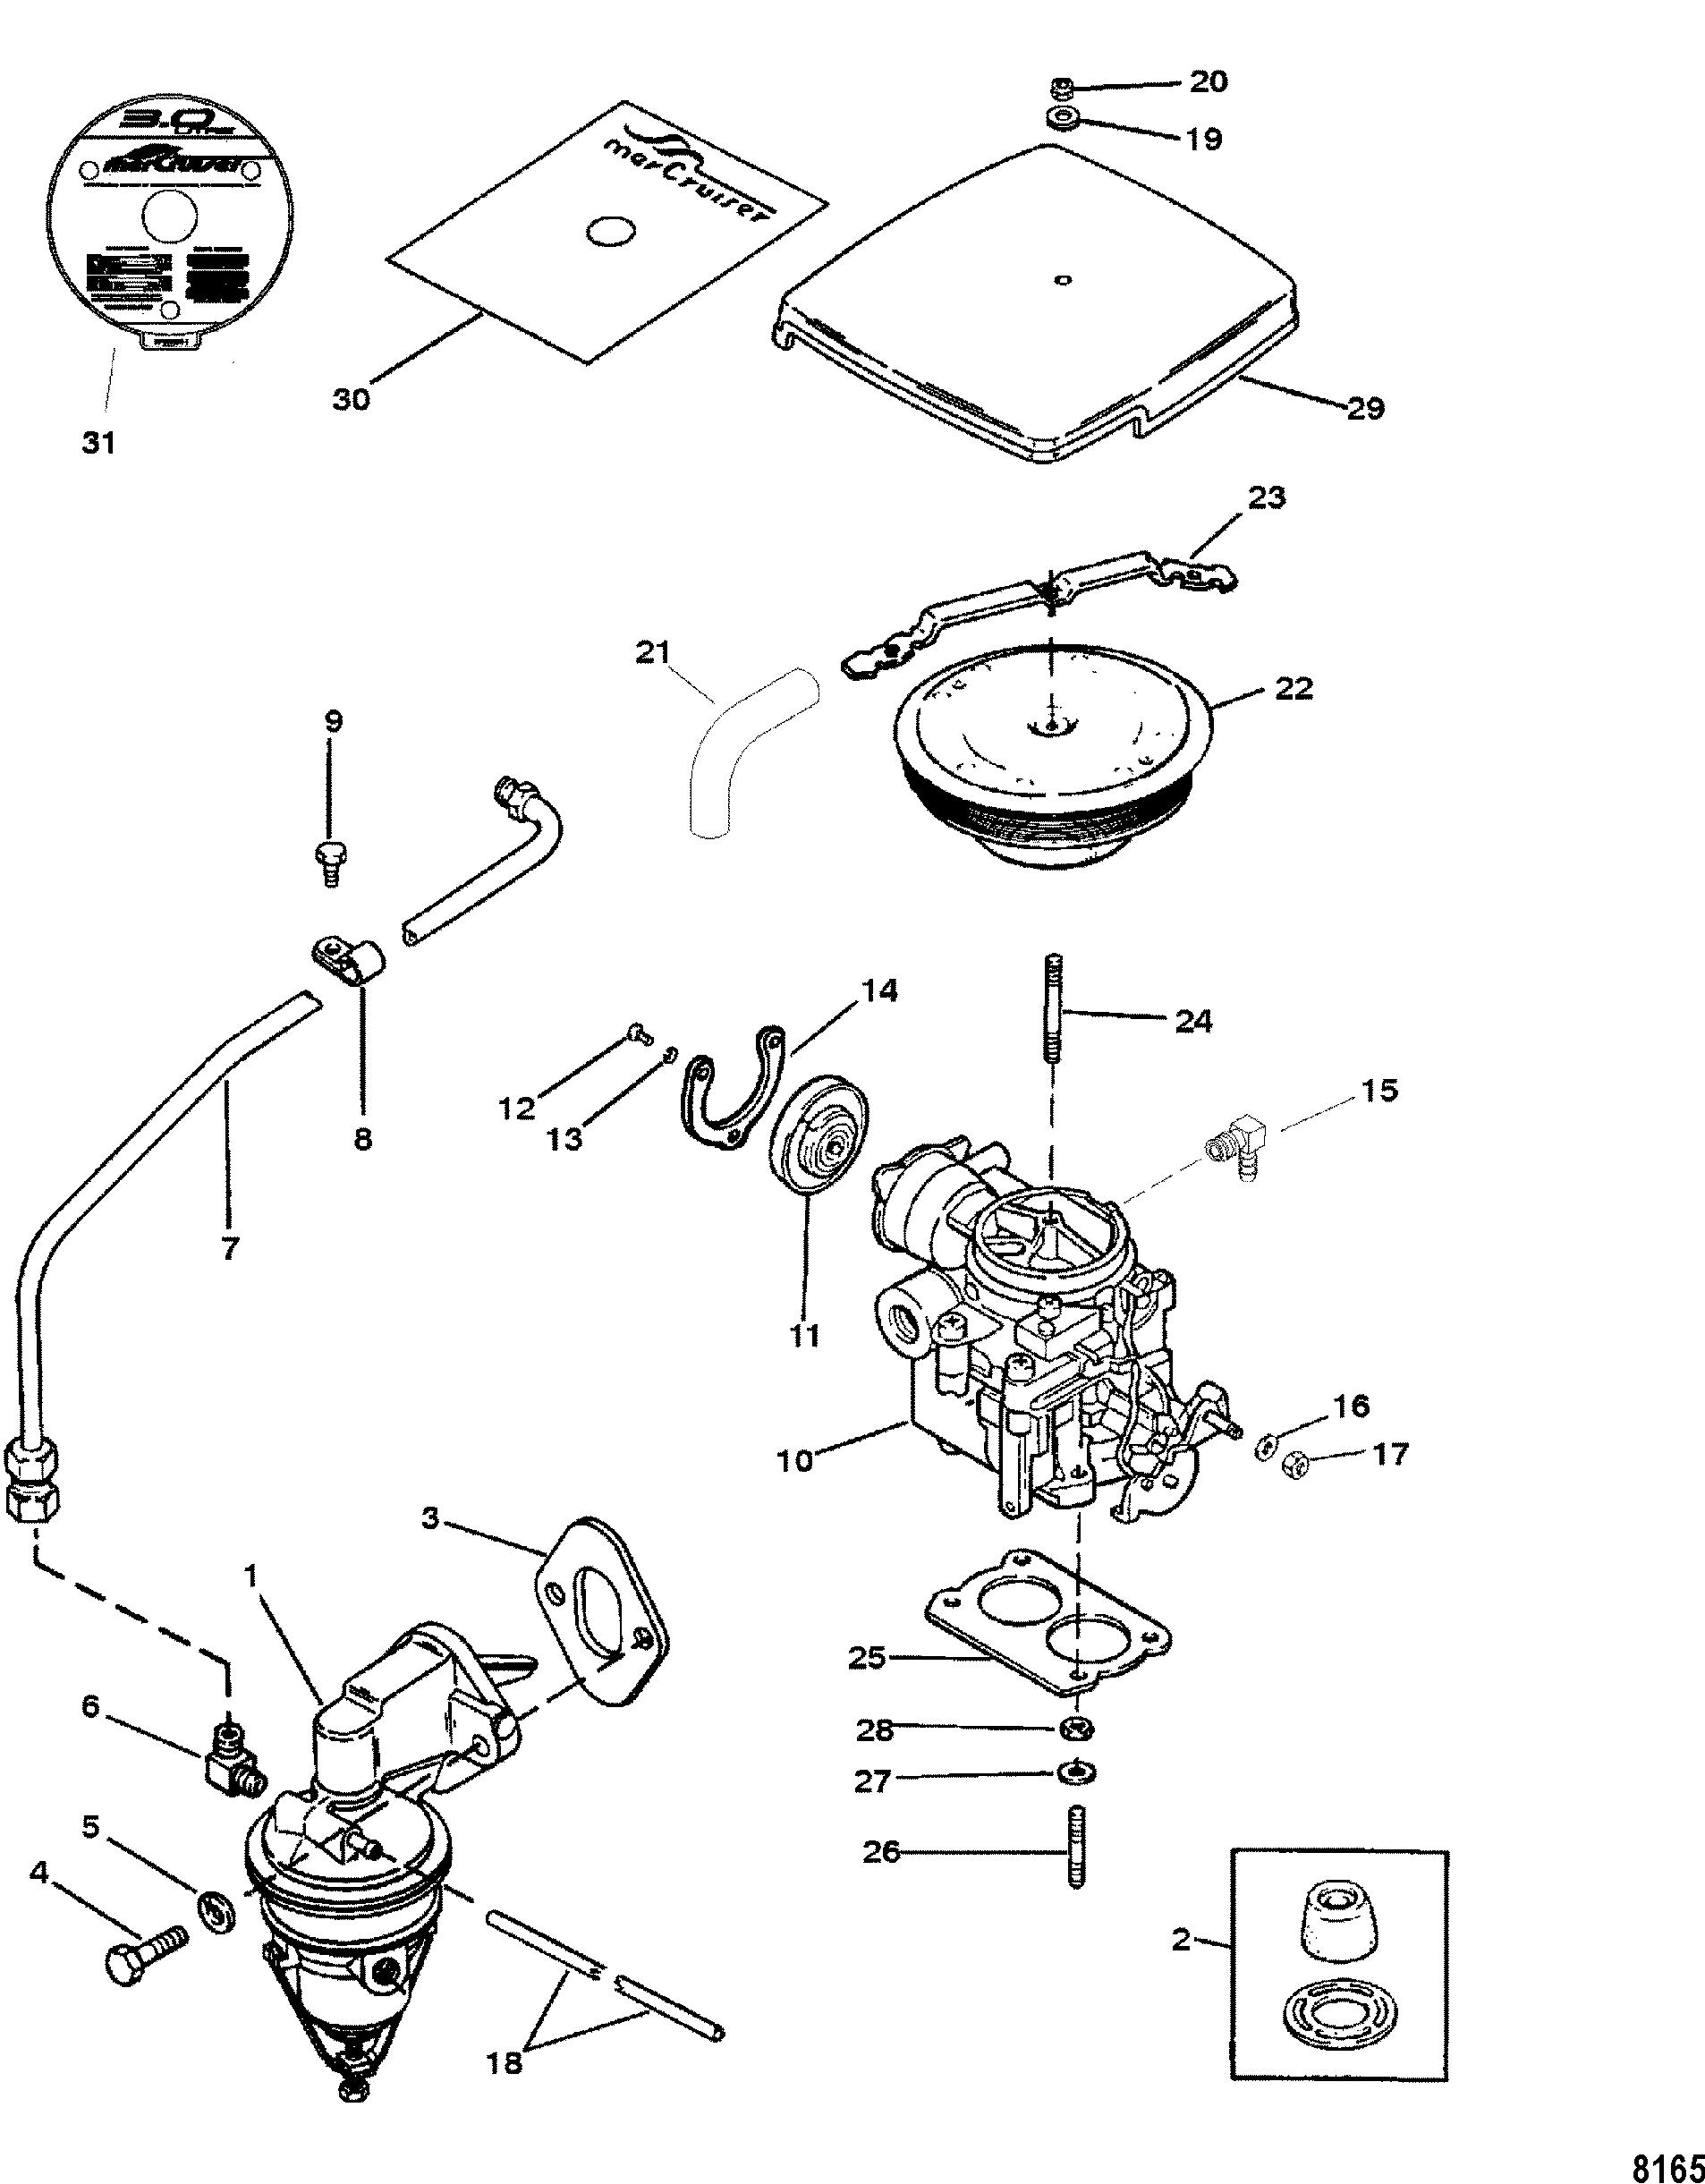 Fuel Pump And Carburetor For Mercruiser 3 0l Lx Alpha One